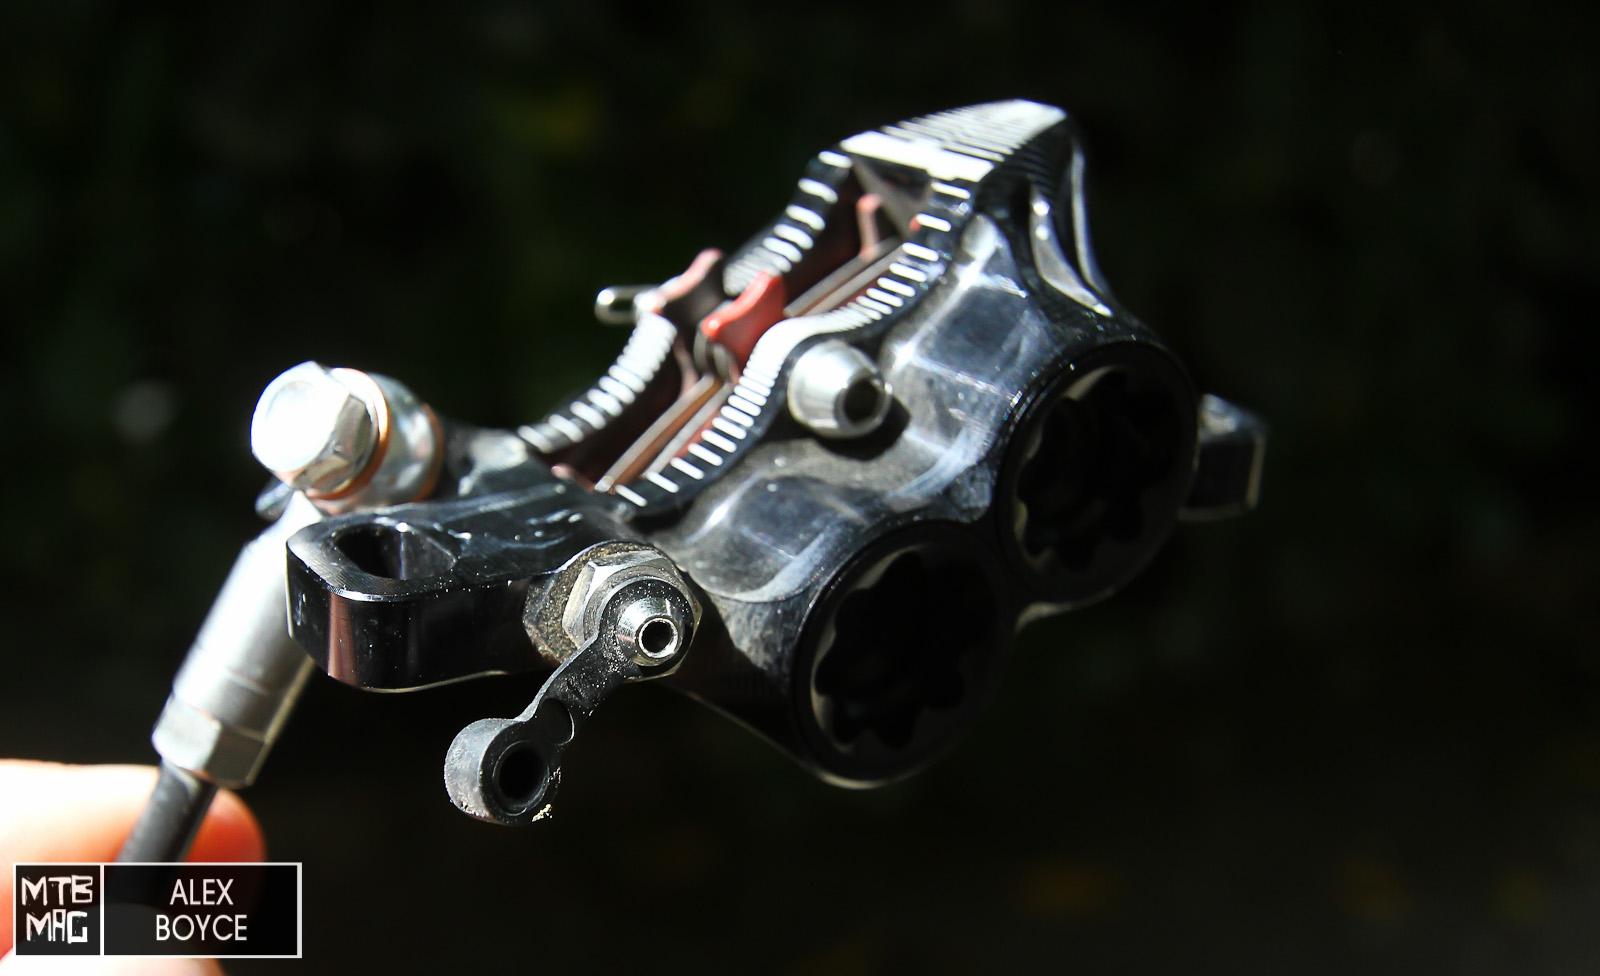 "Kanon 60"" Veriner Caliper - bidspotter.com"